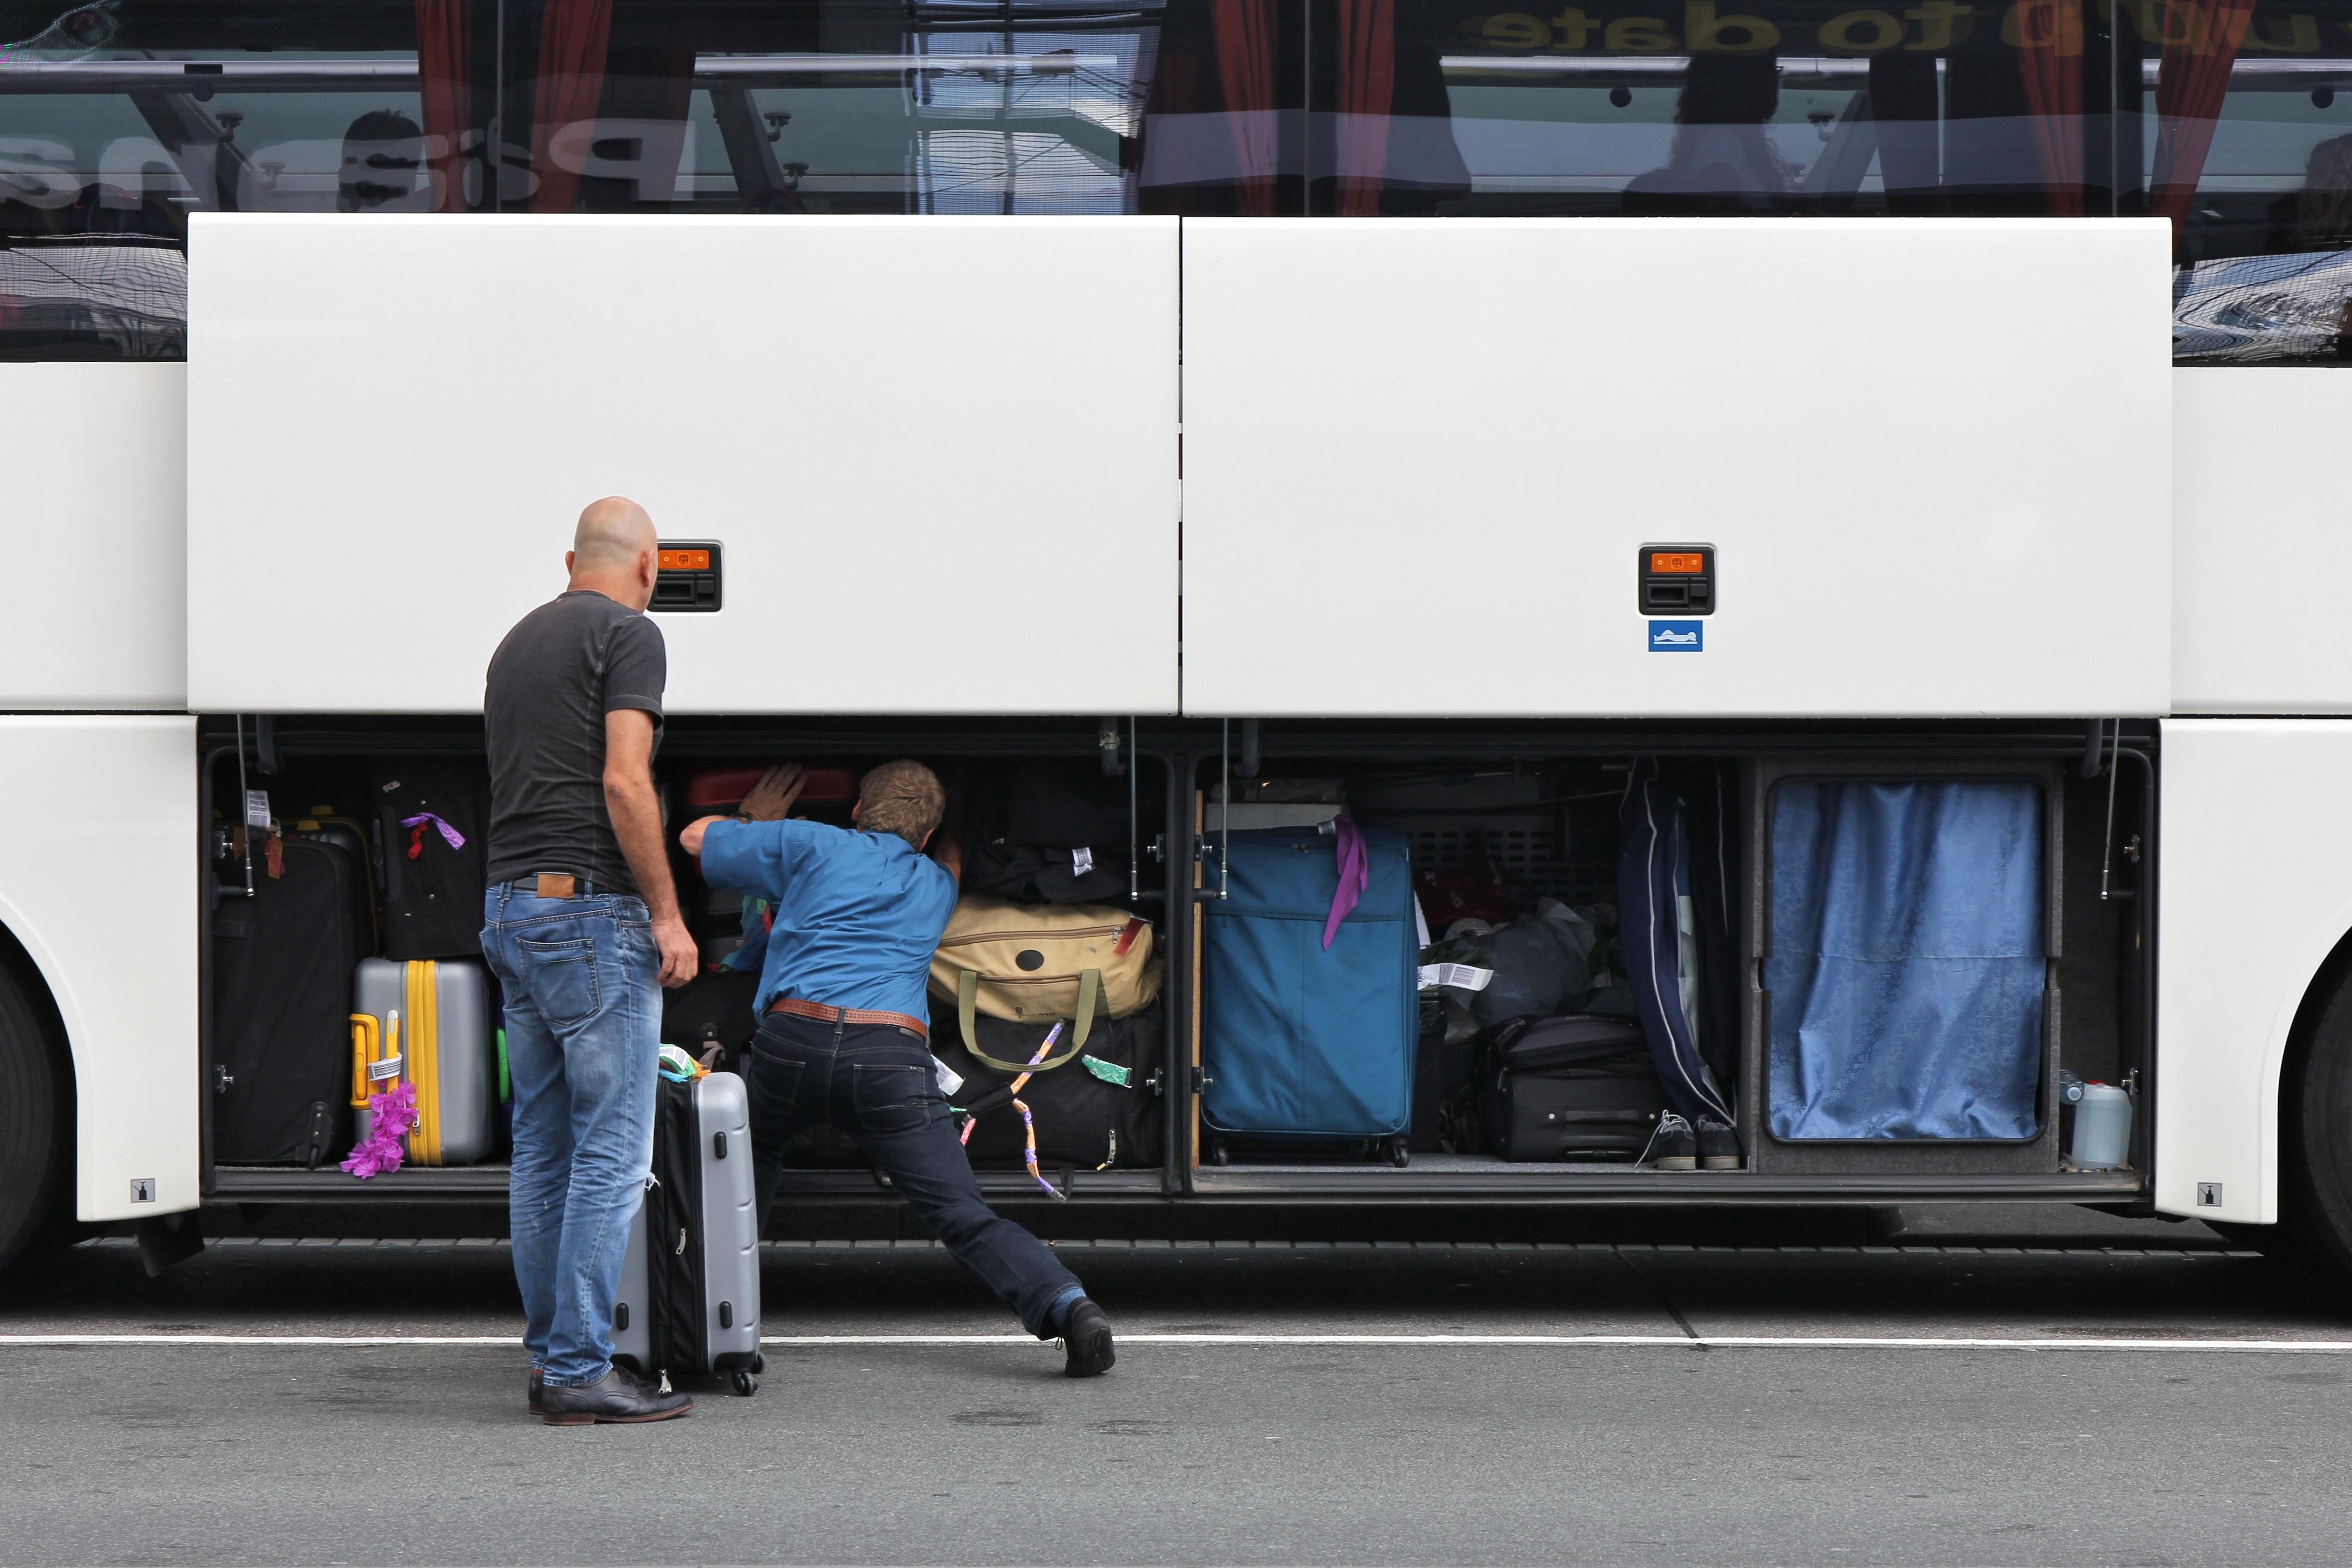 aqluiler bus Benidorm